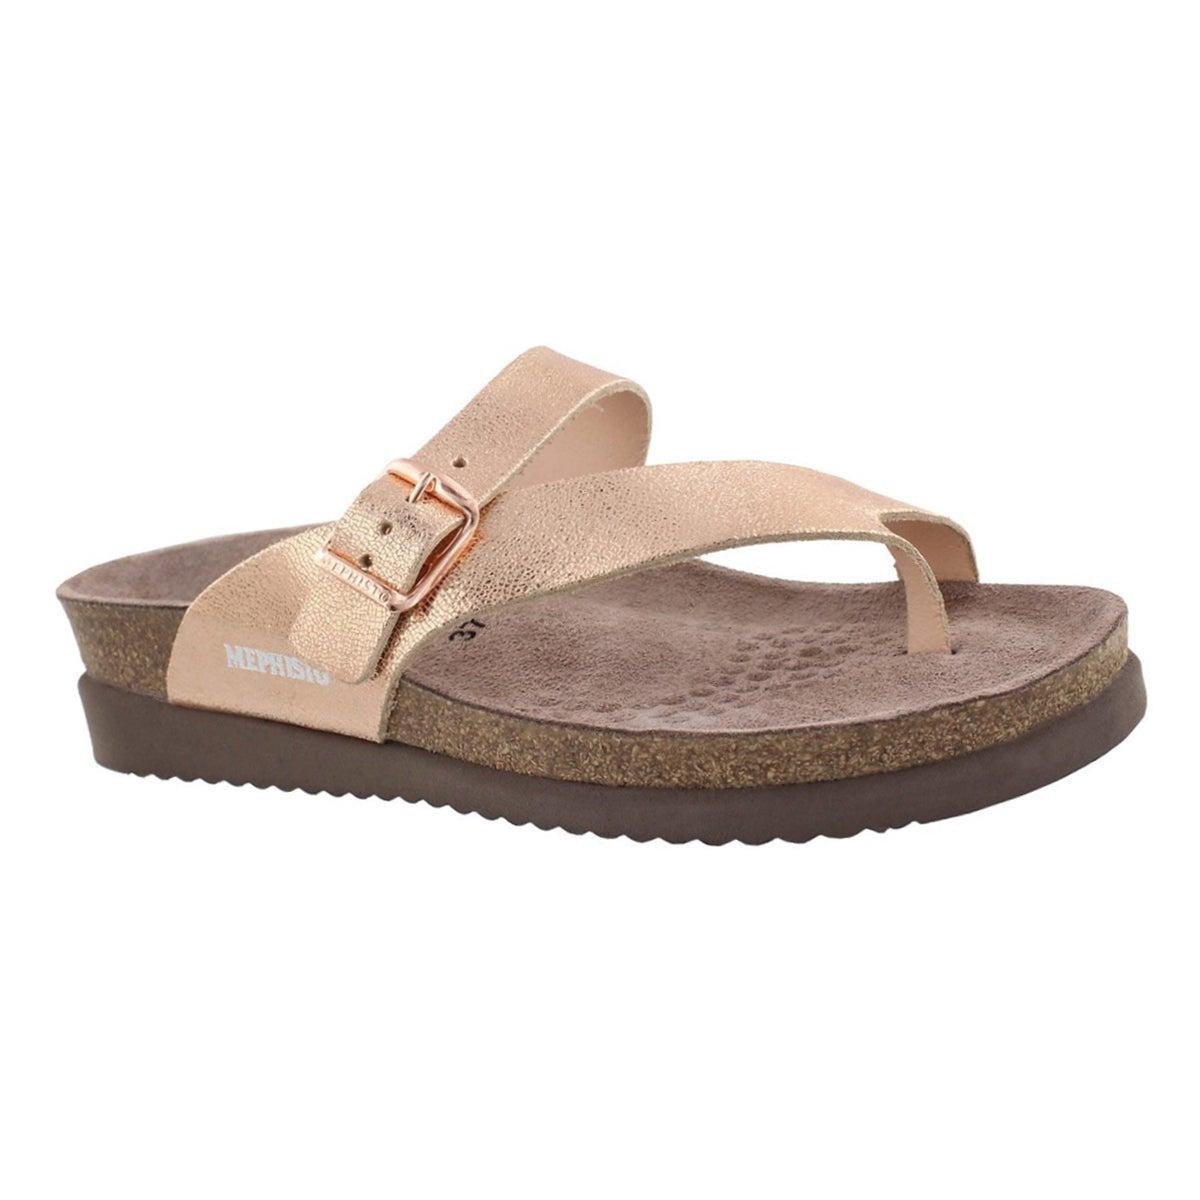 Women's HELEN gold cork footbed thongs